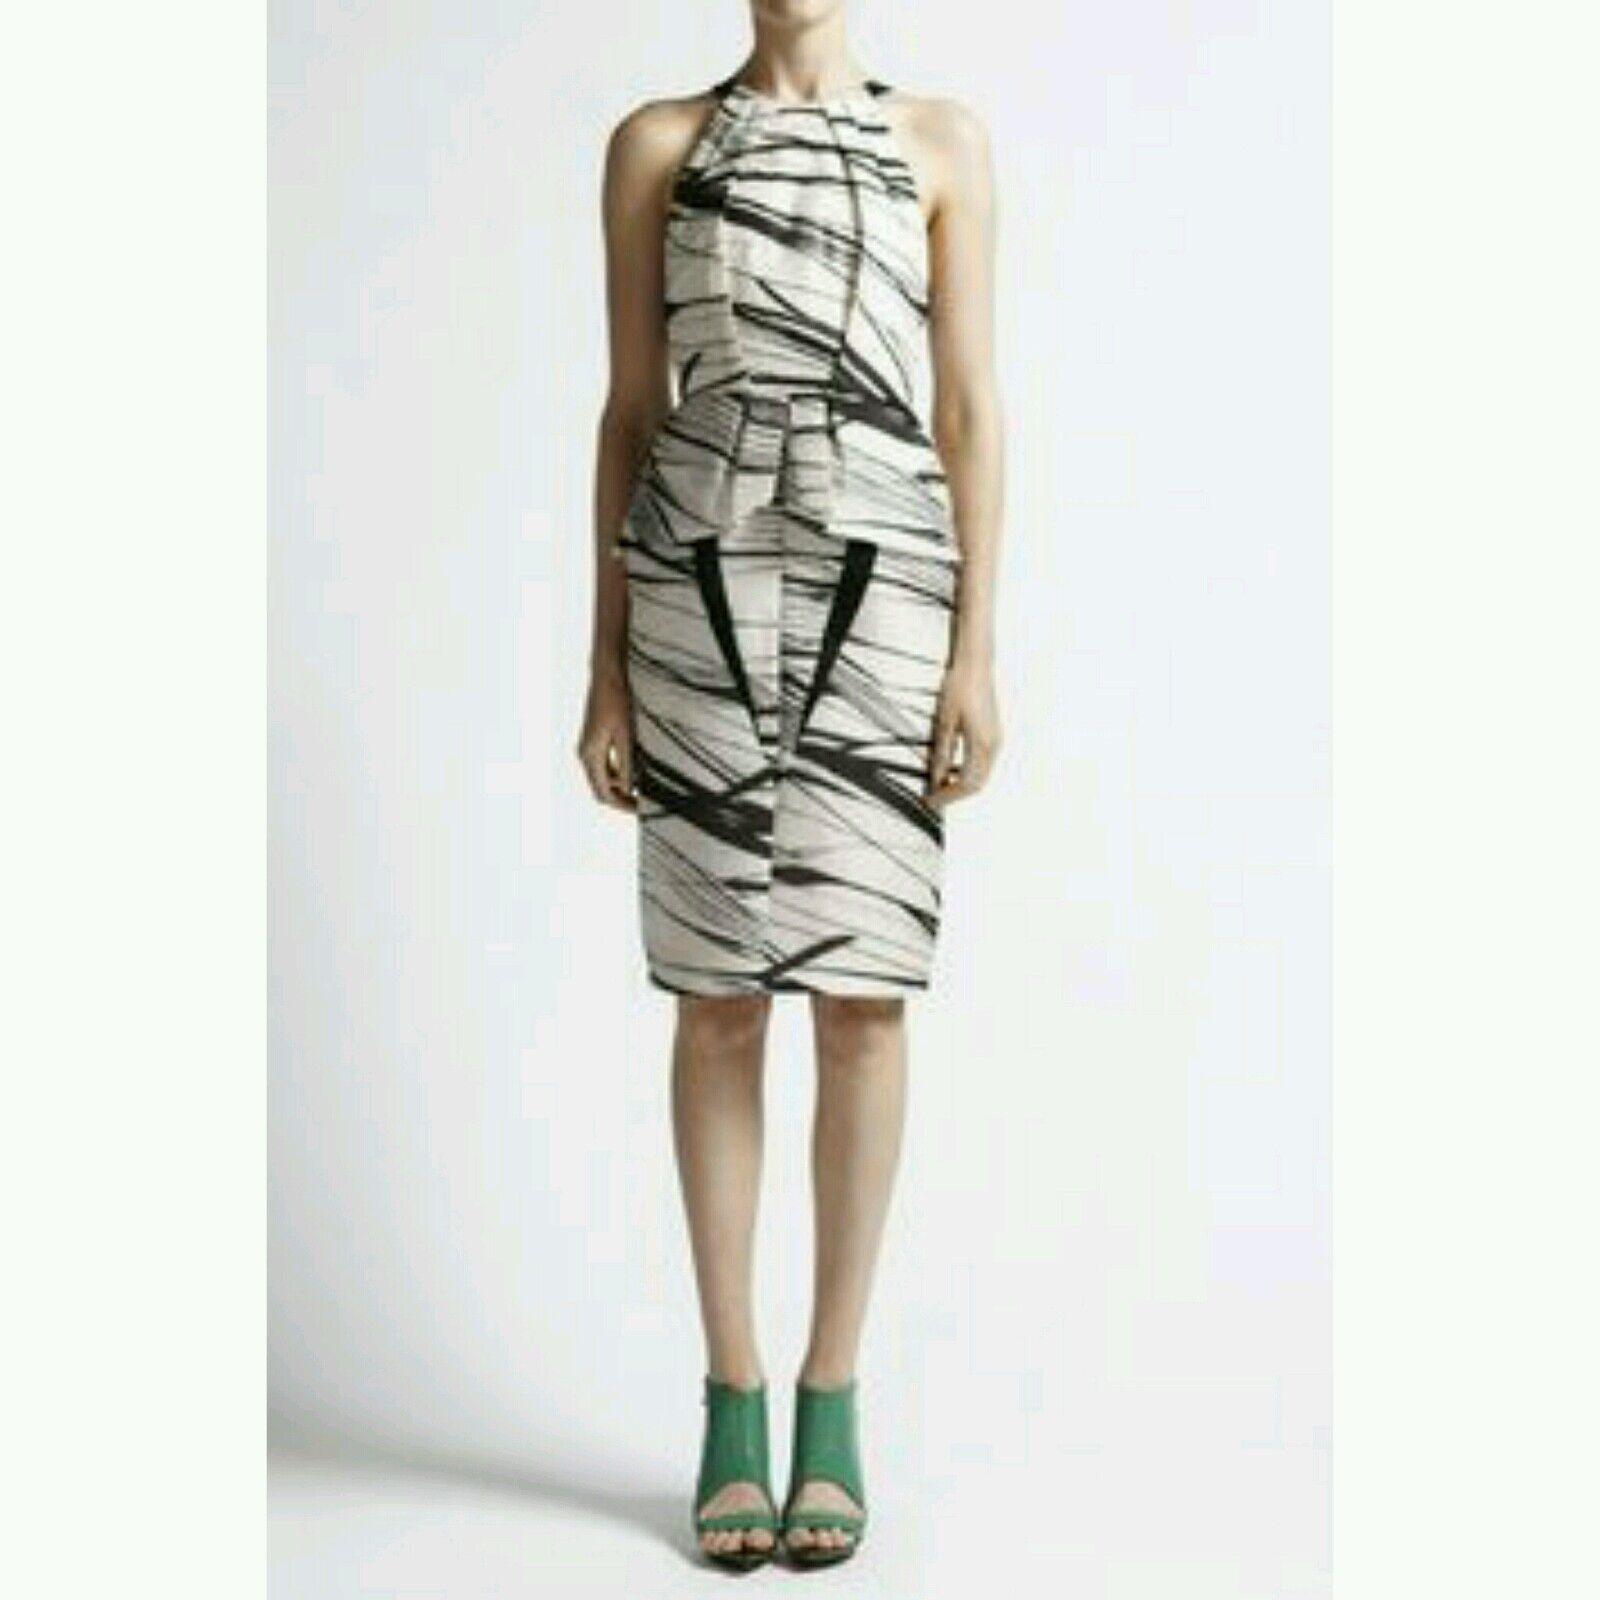 NWT Manning Cartell Irregular Stripe Silk Organdy Dress US 4